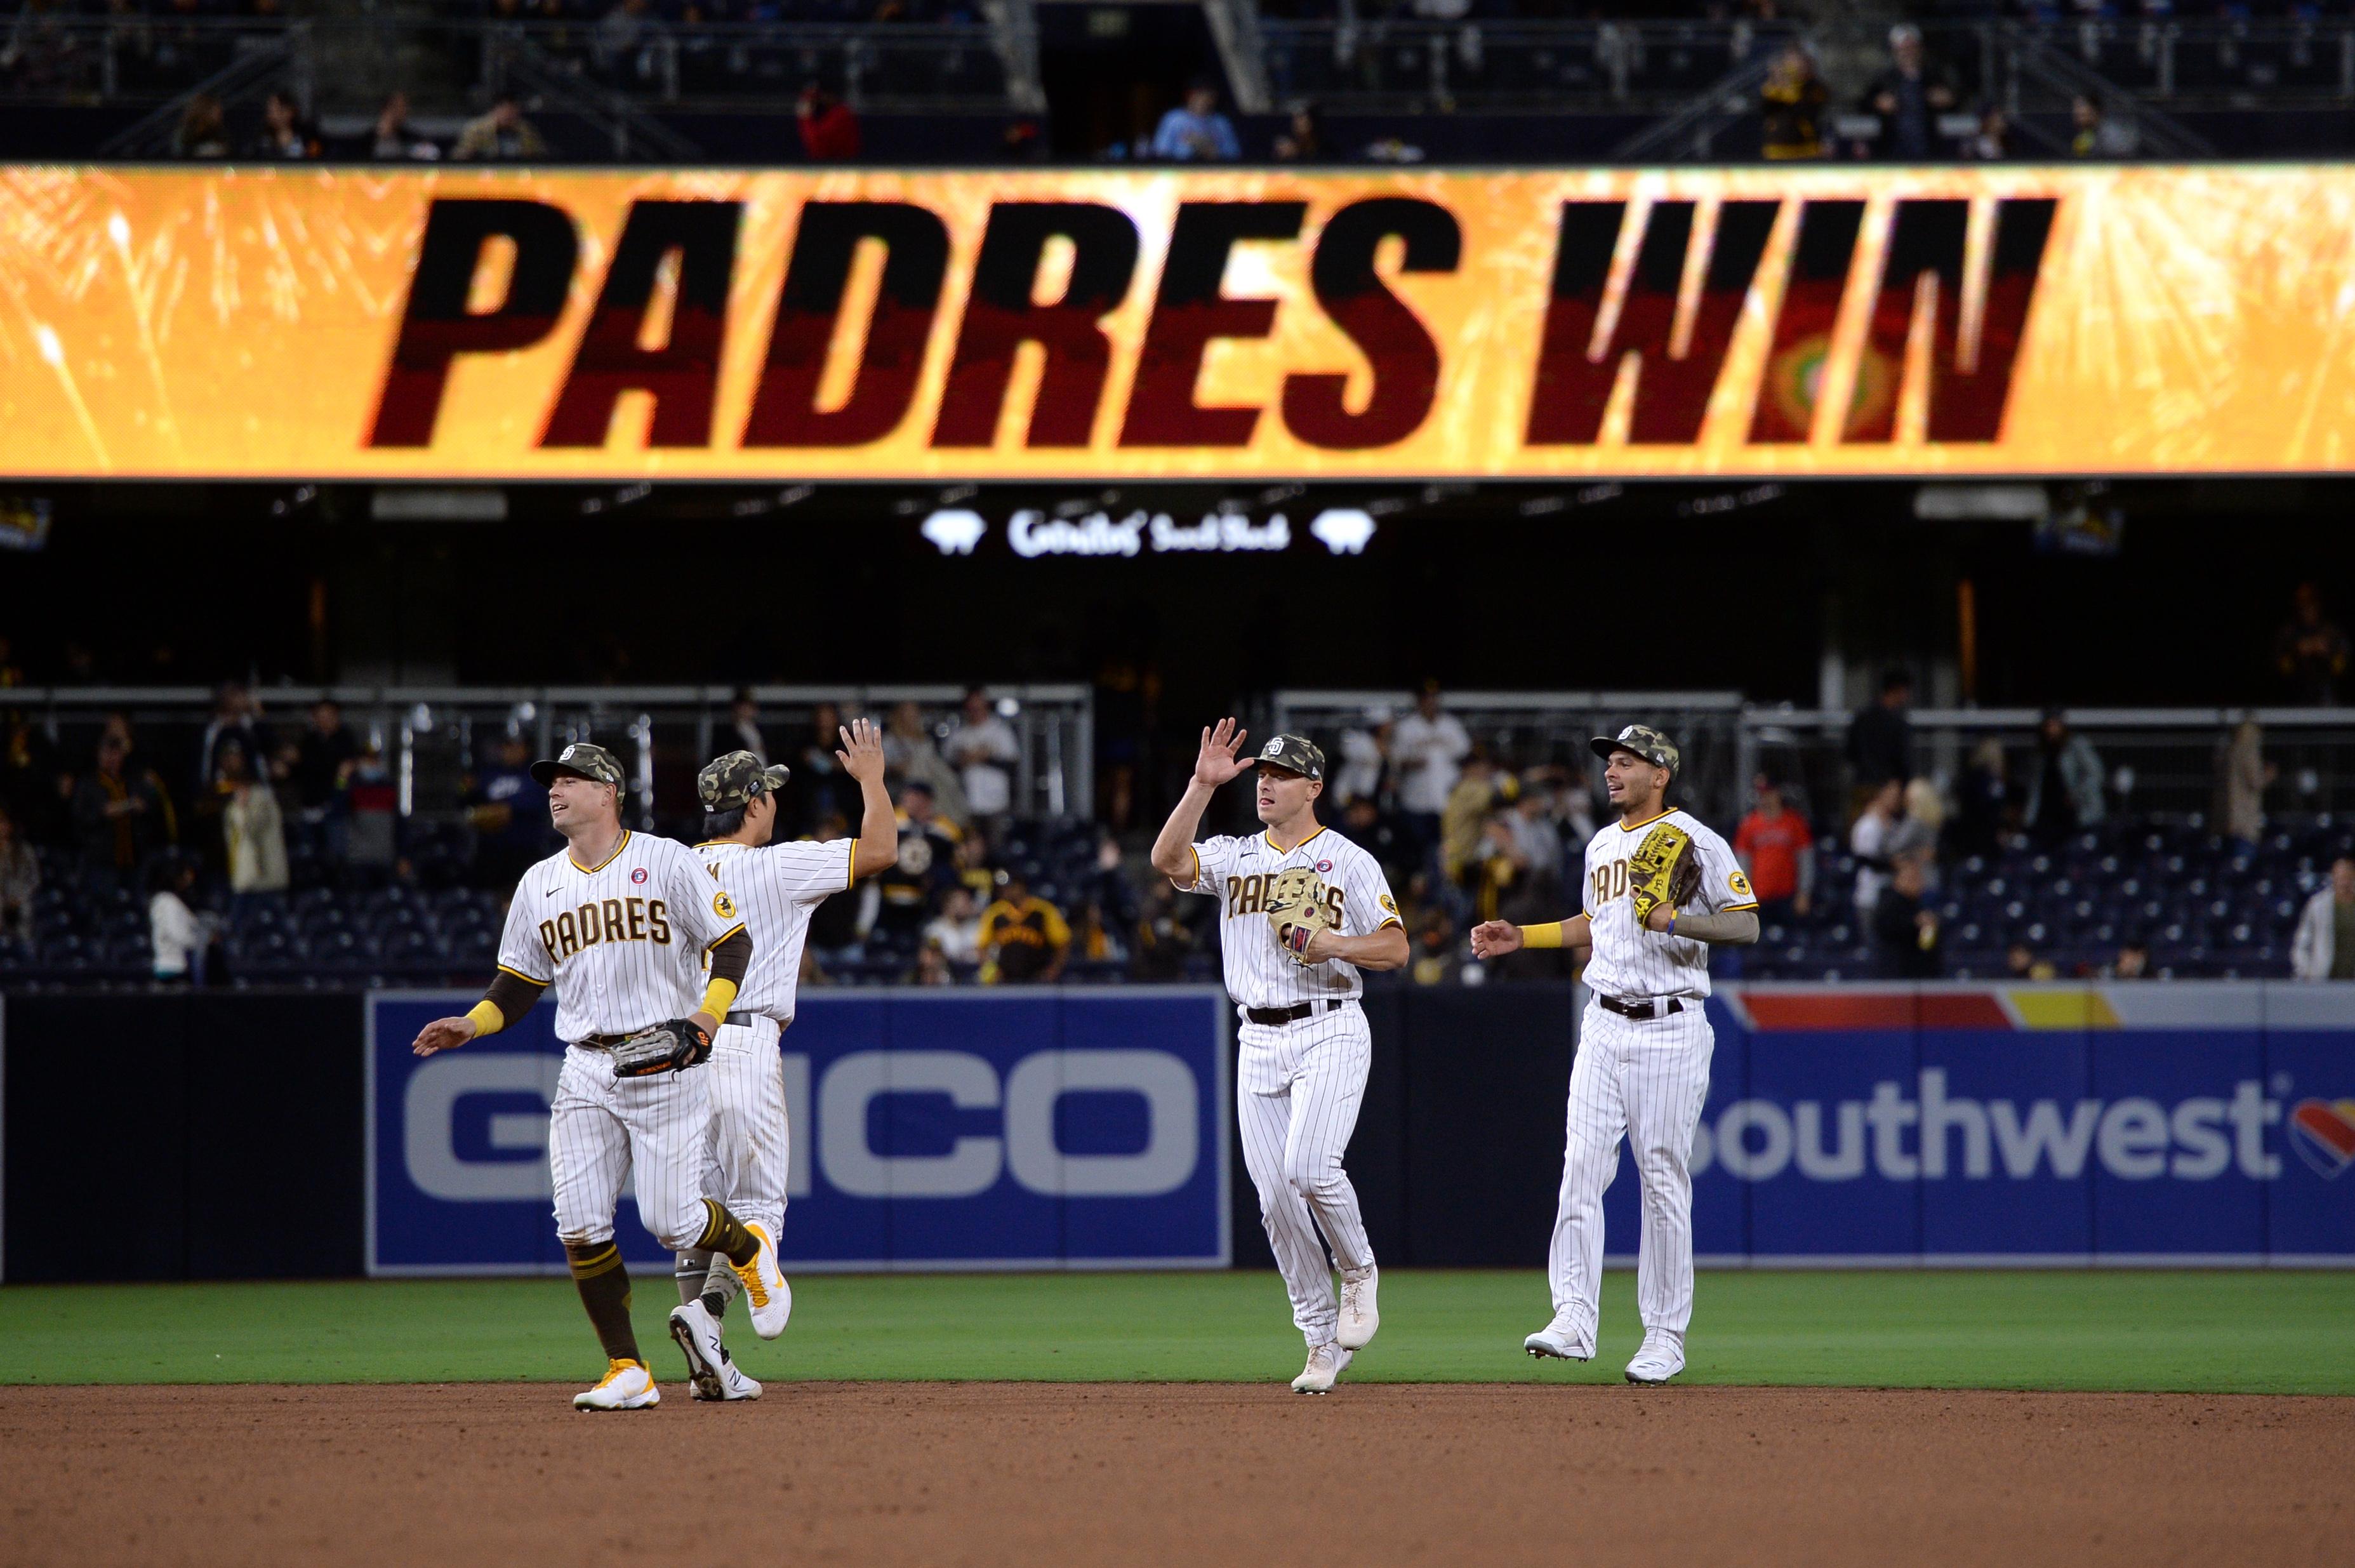 MLB:圣地亚哥班克斯的圣路易斯红雀队